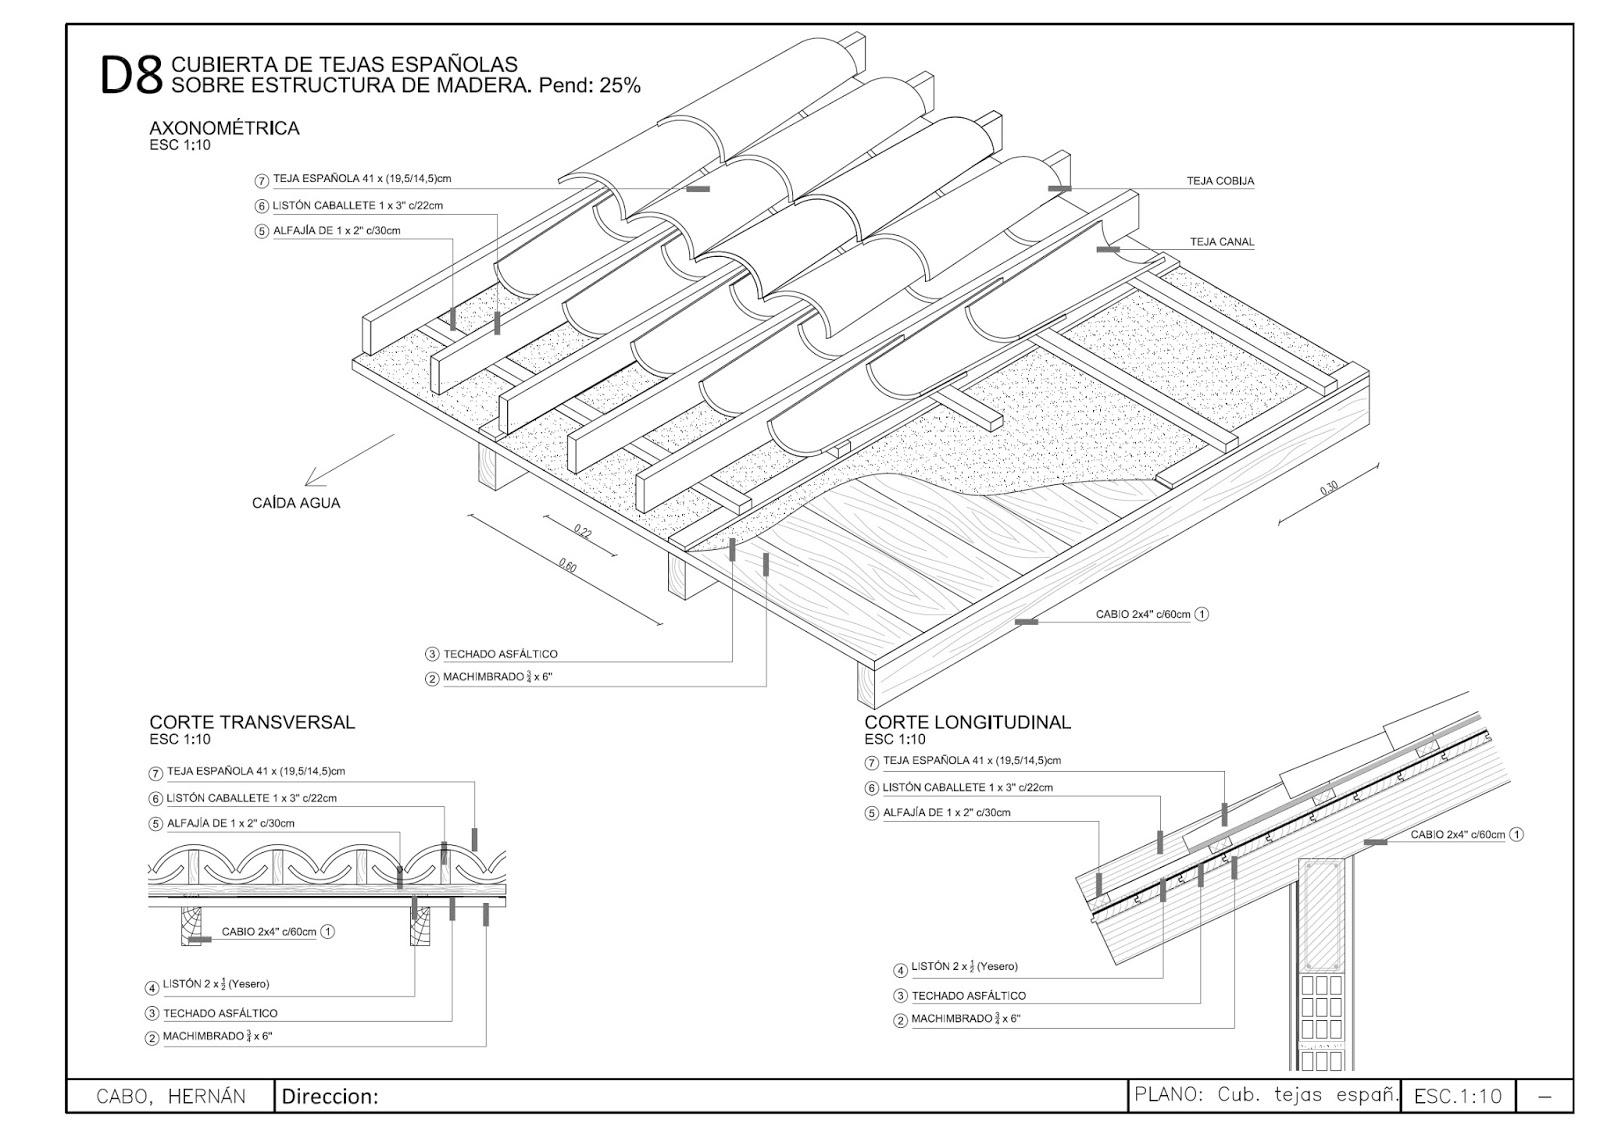 Detalles constructivos de techos 28 images detalles constructivos cad 3d forjado de viguetas - Detalle constructivo techo ...